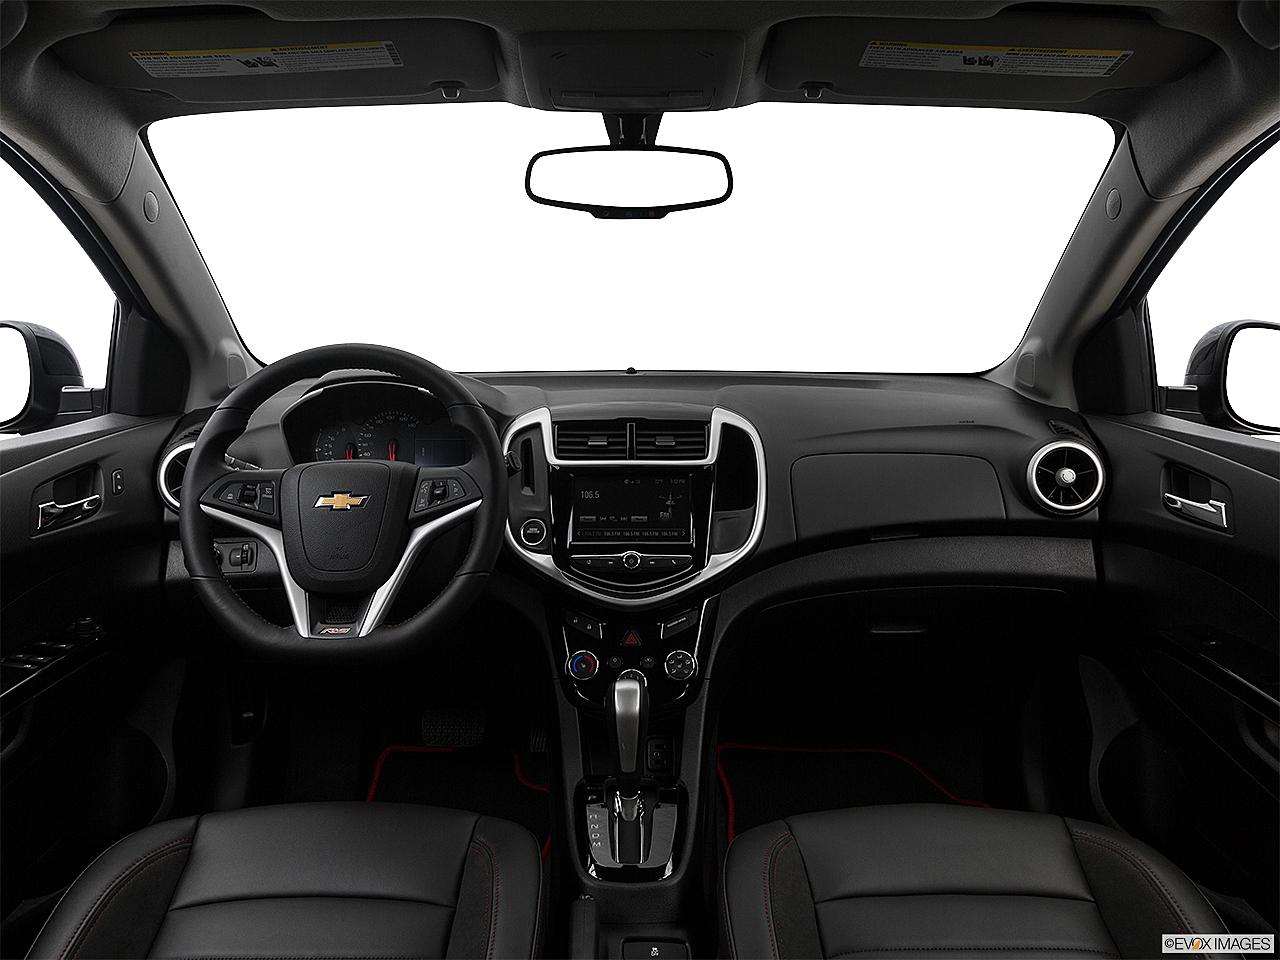 2017 chevrolet sonic premier auto 4dr hatchback research groovecar. Black Bedroom Furniture Sets. Home Design Ideas